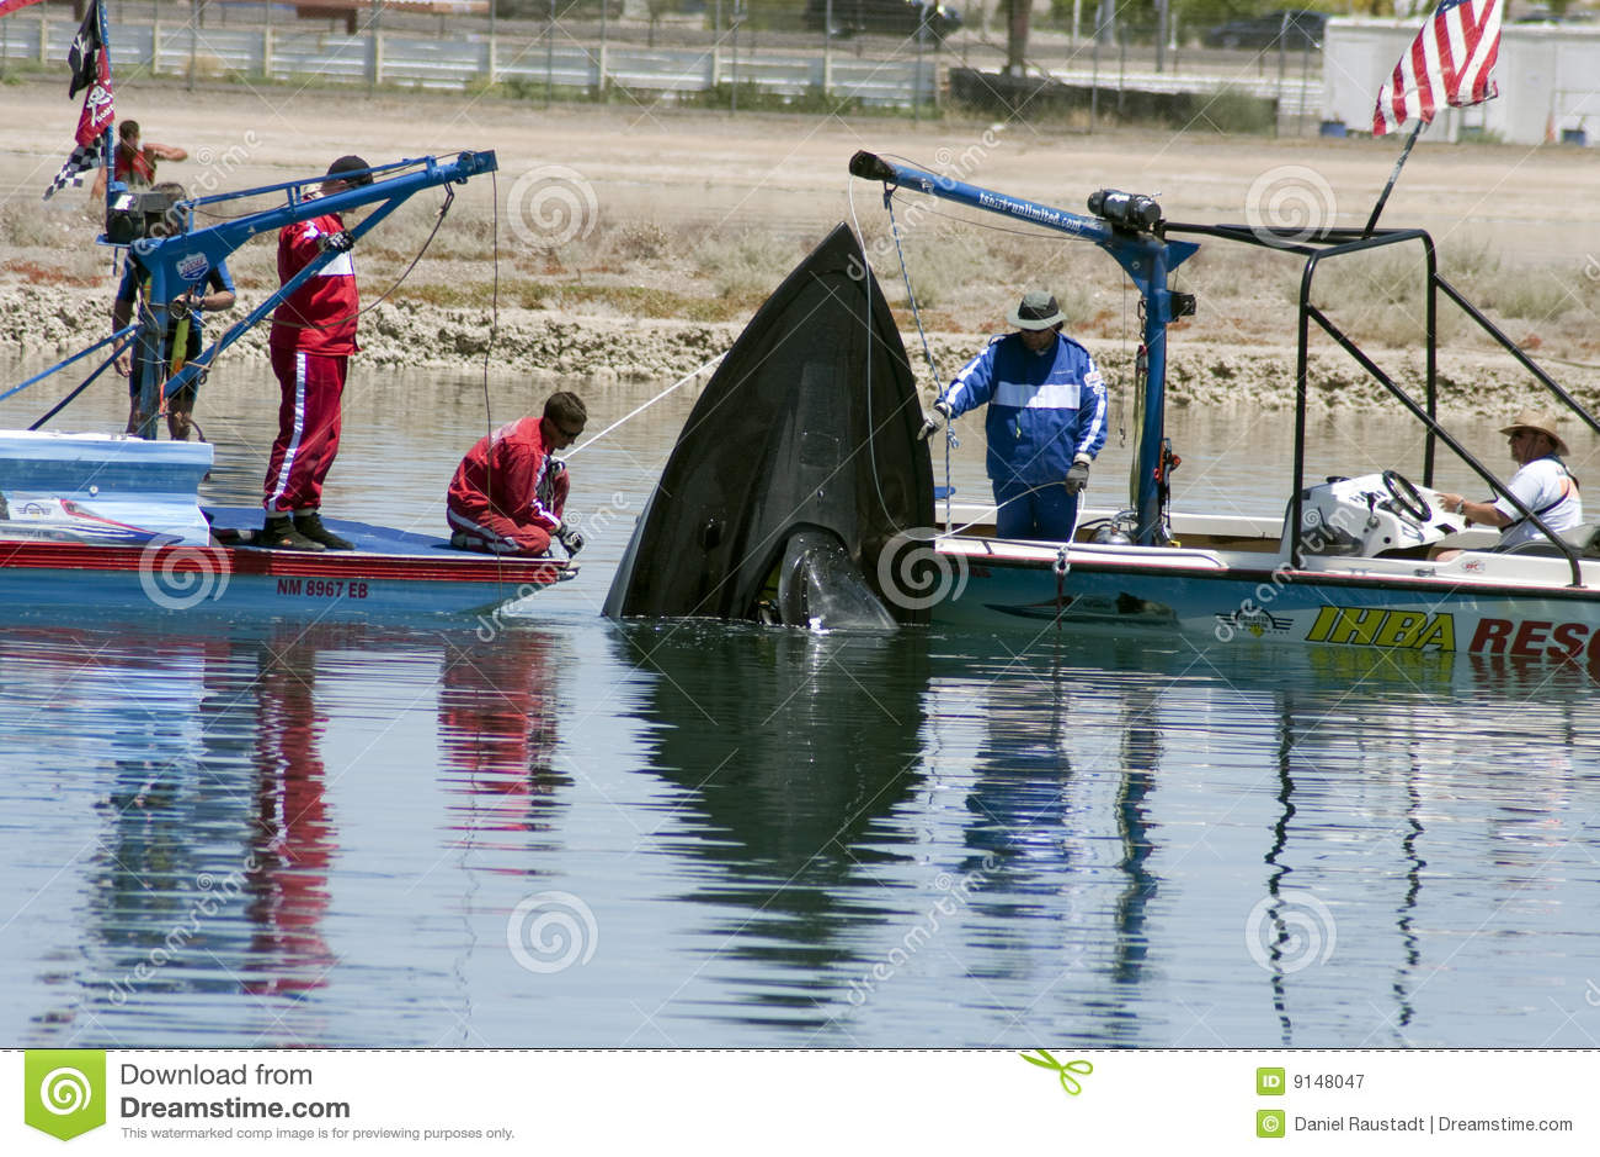 IHBA Hydroplane Boat Crash Rescue